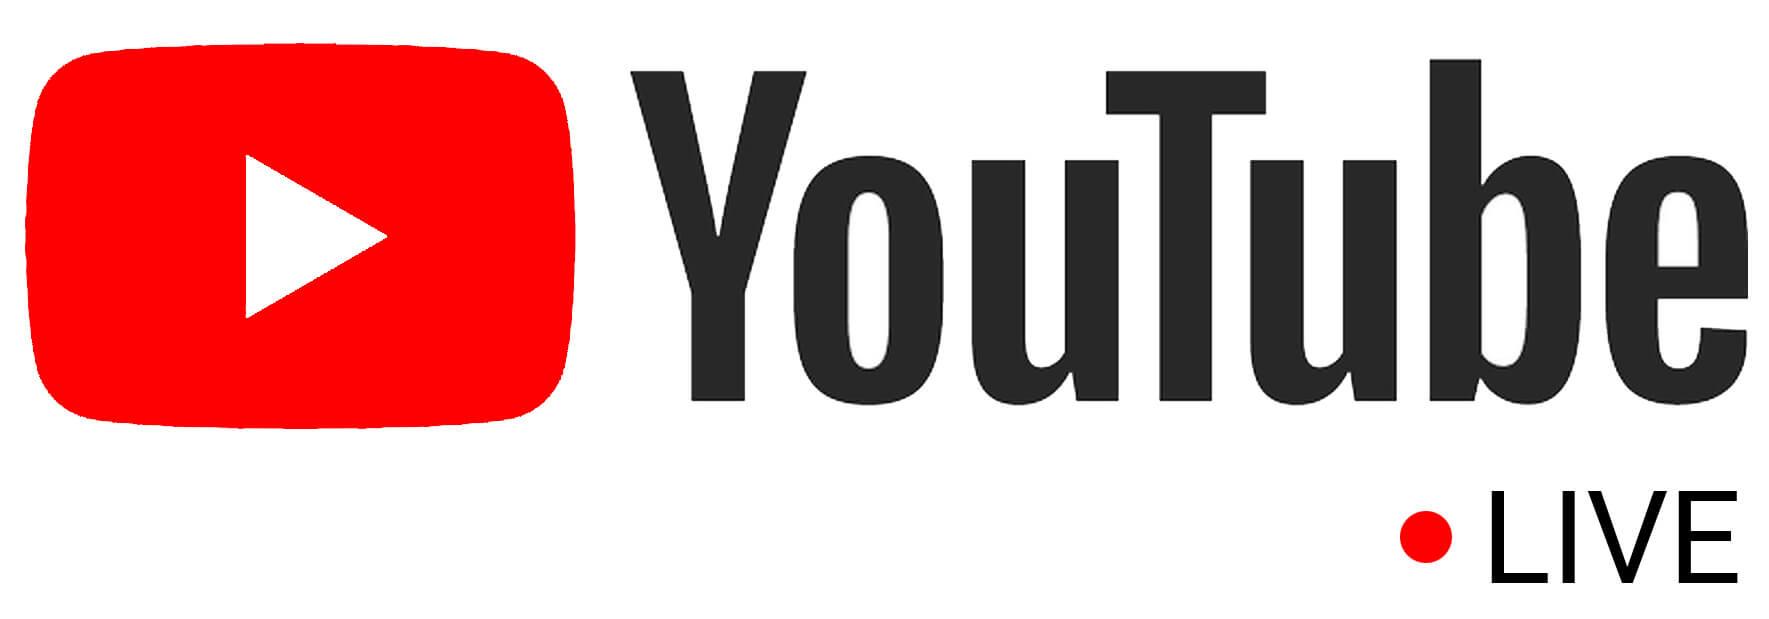 youtube logo no border